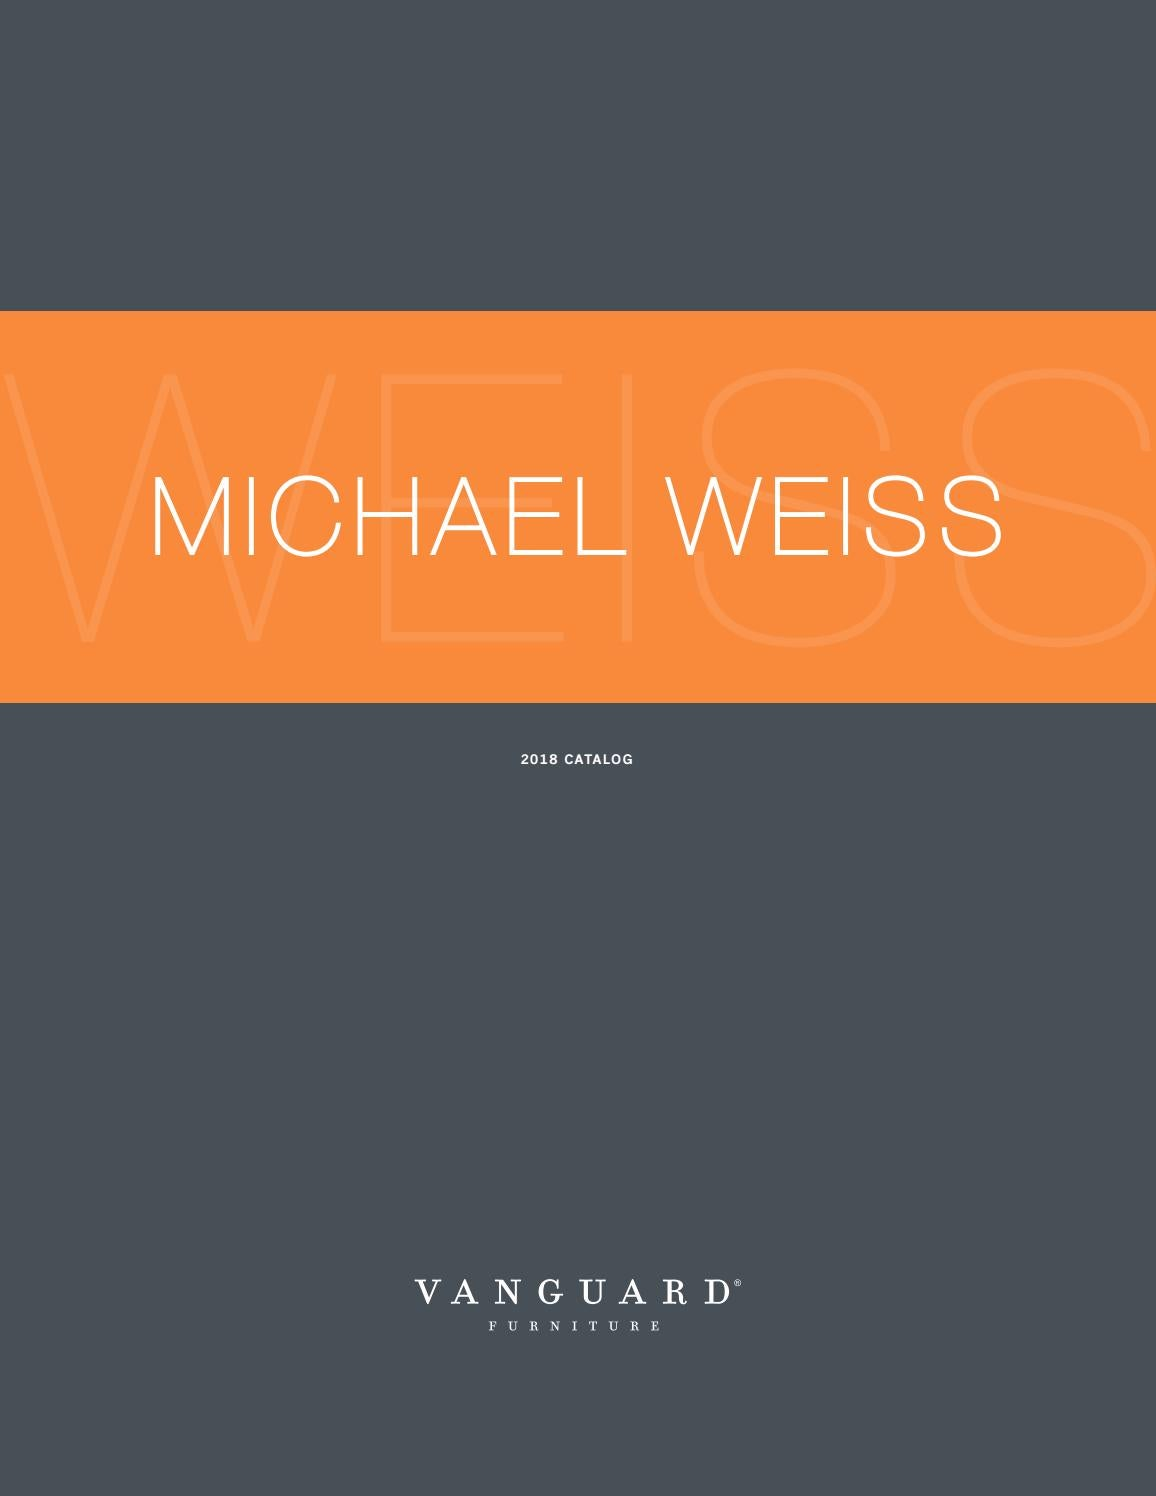 Michael Weiss Catalog 2018 by Vanguard Furniture issuu